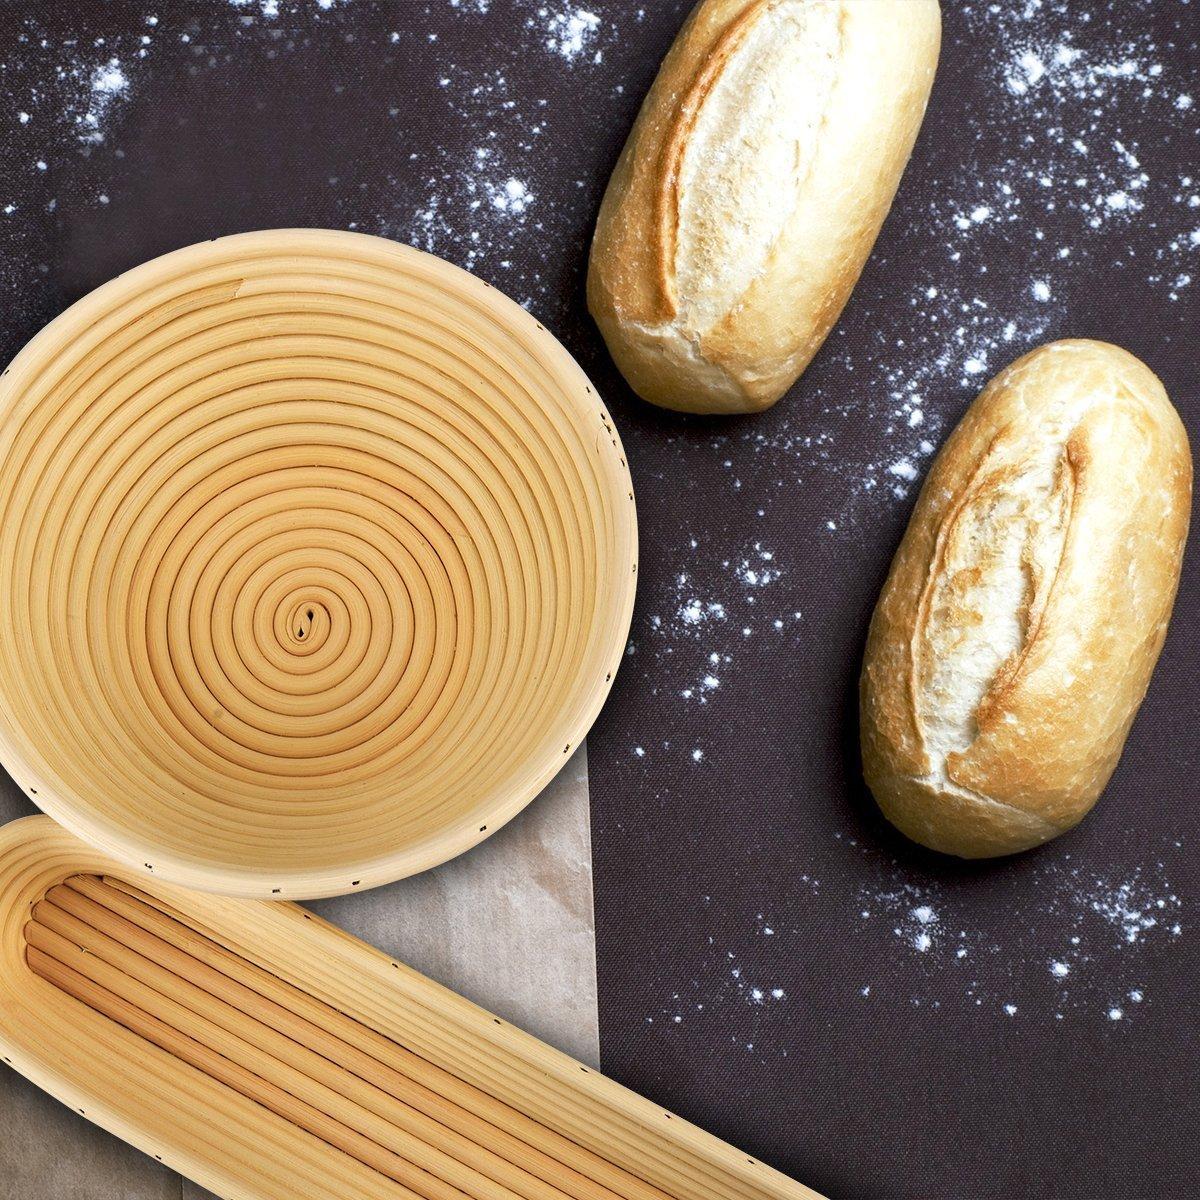 obeauty blanco ratán Sourdough Banneton Brotform Pan Cesta de pruebas masa con libre gamuza de tejido lino: Amazon.es: Hogar